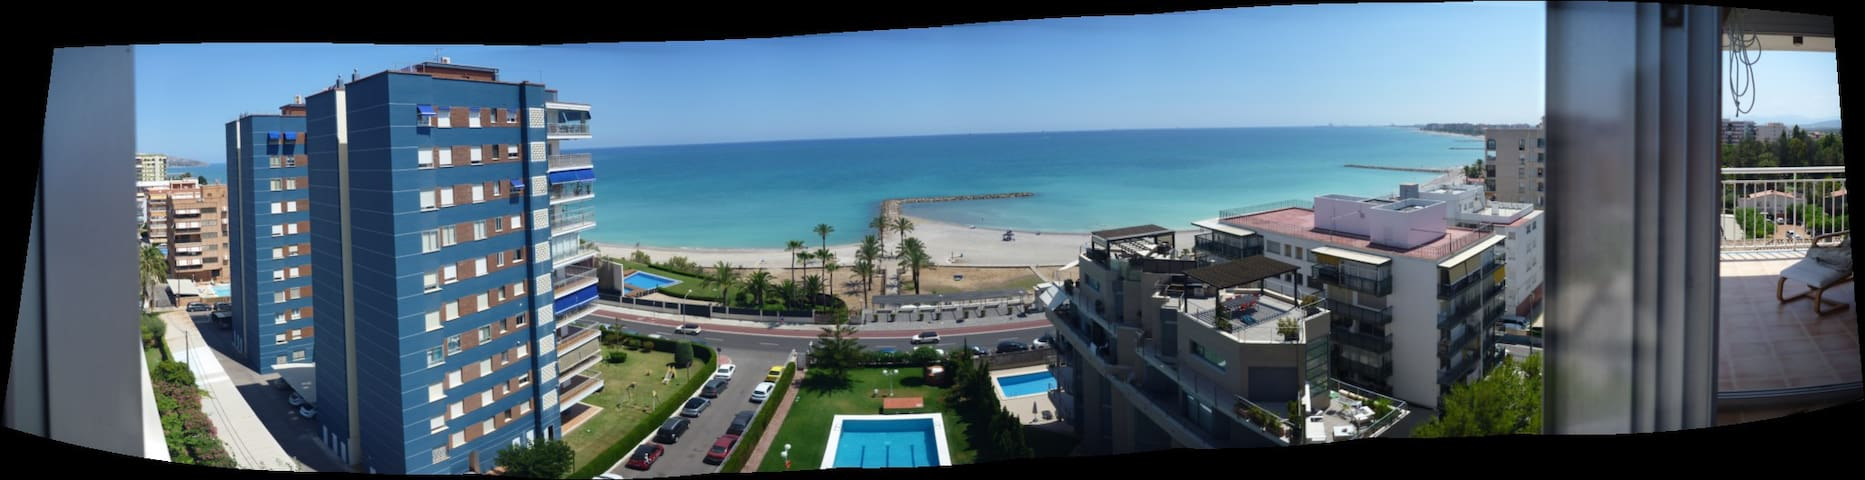 Apartamento Astoria, primera linea playa,wifi.